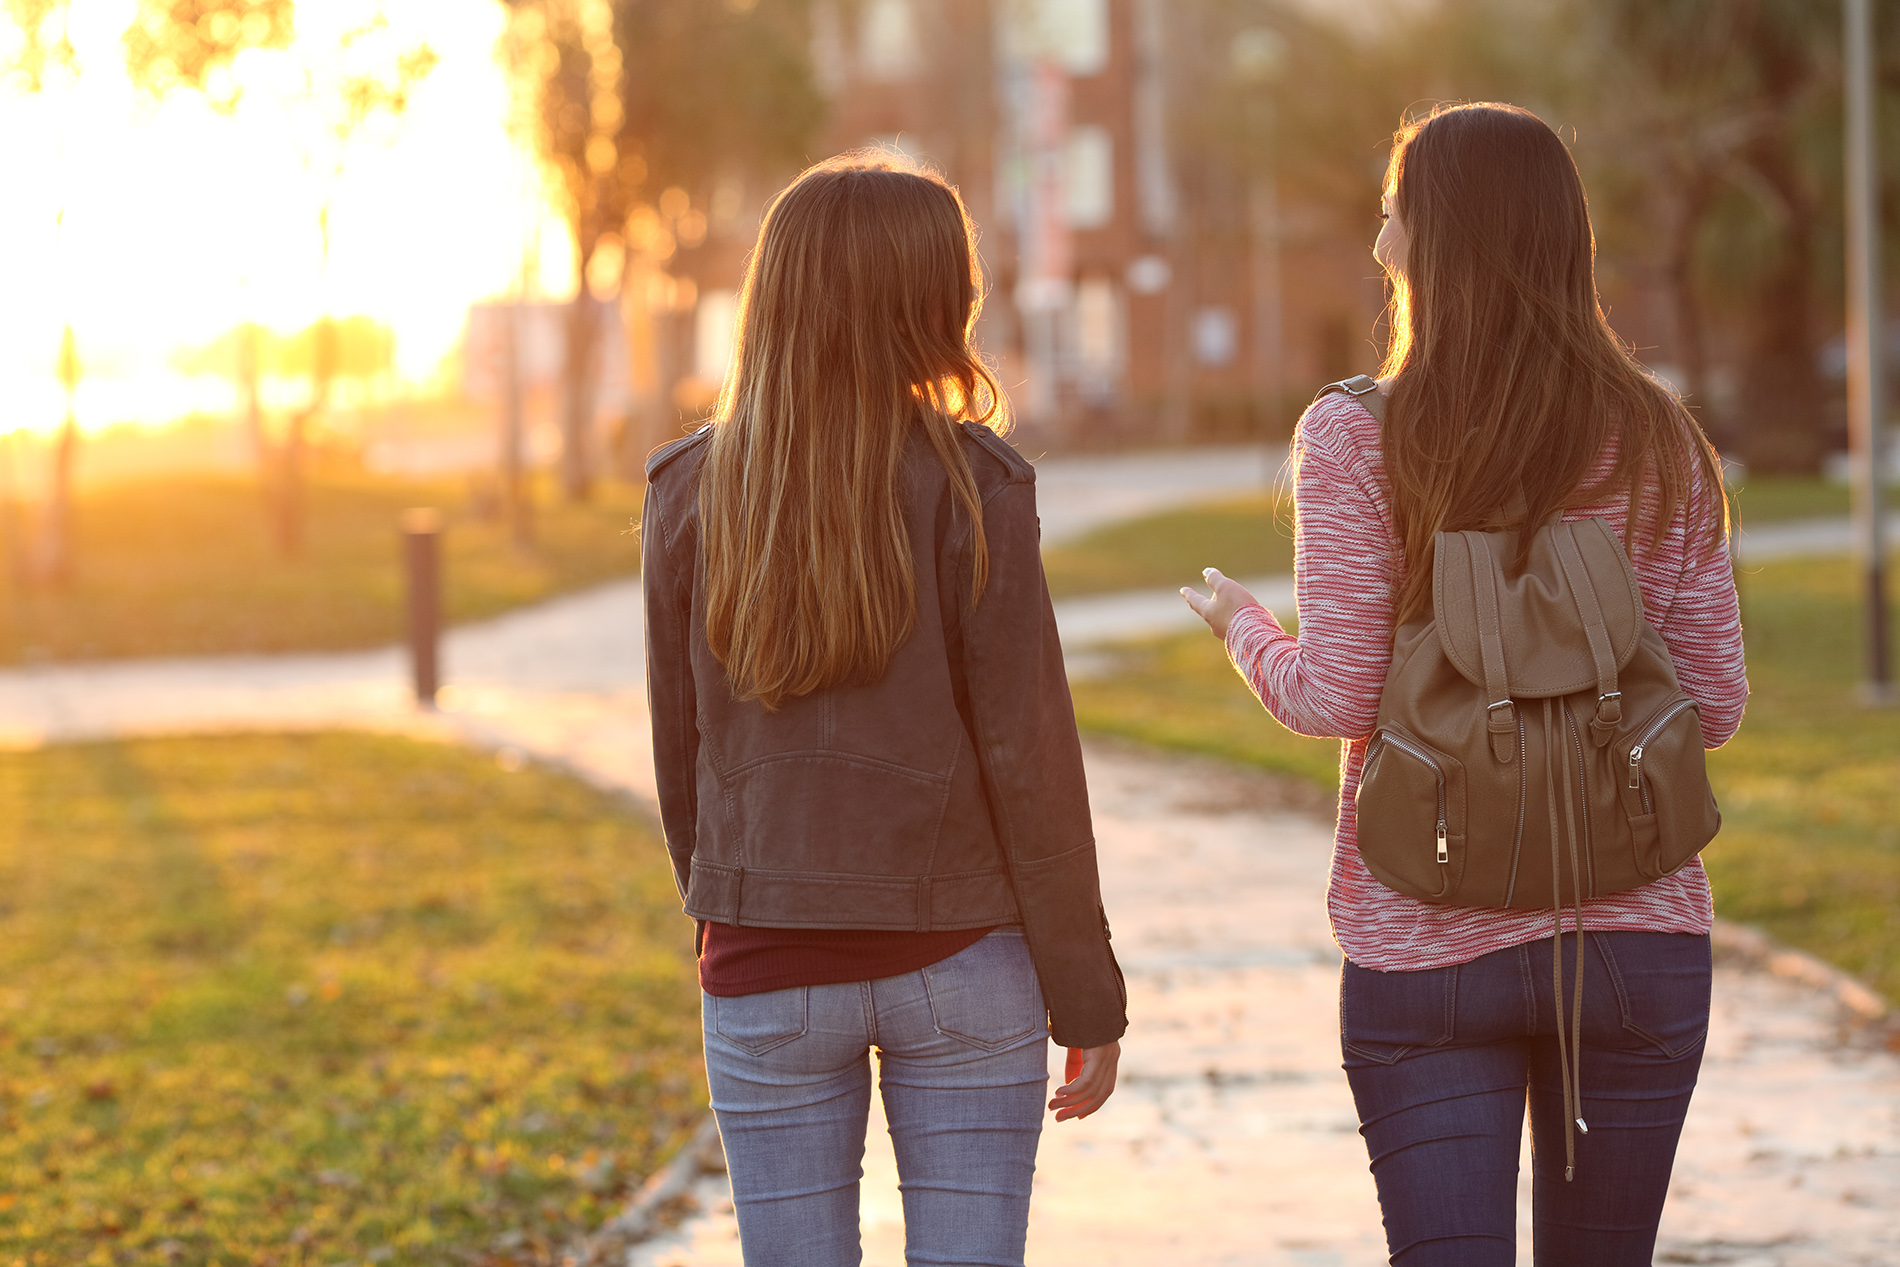 Teens girls walking with backpacks